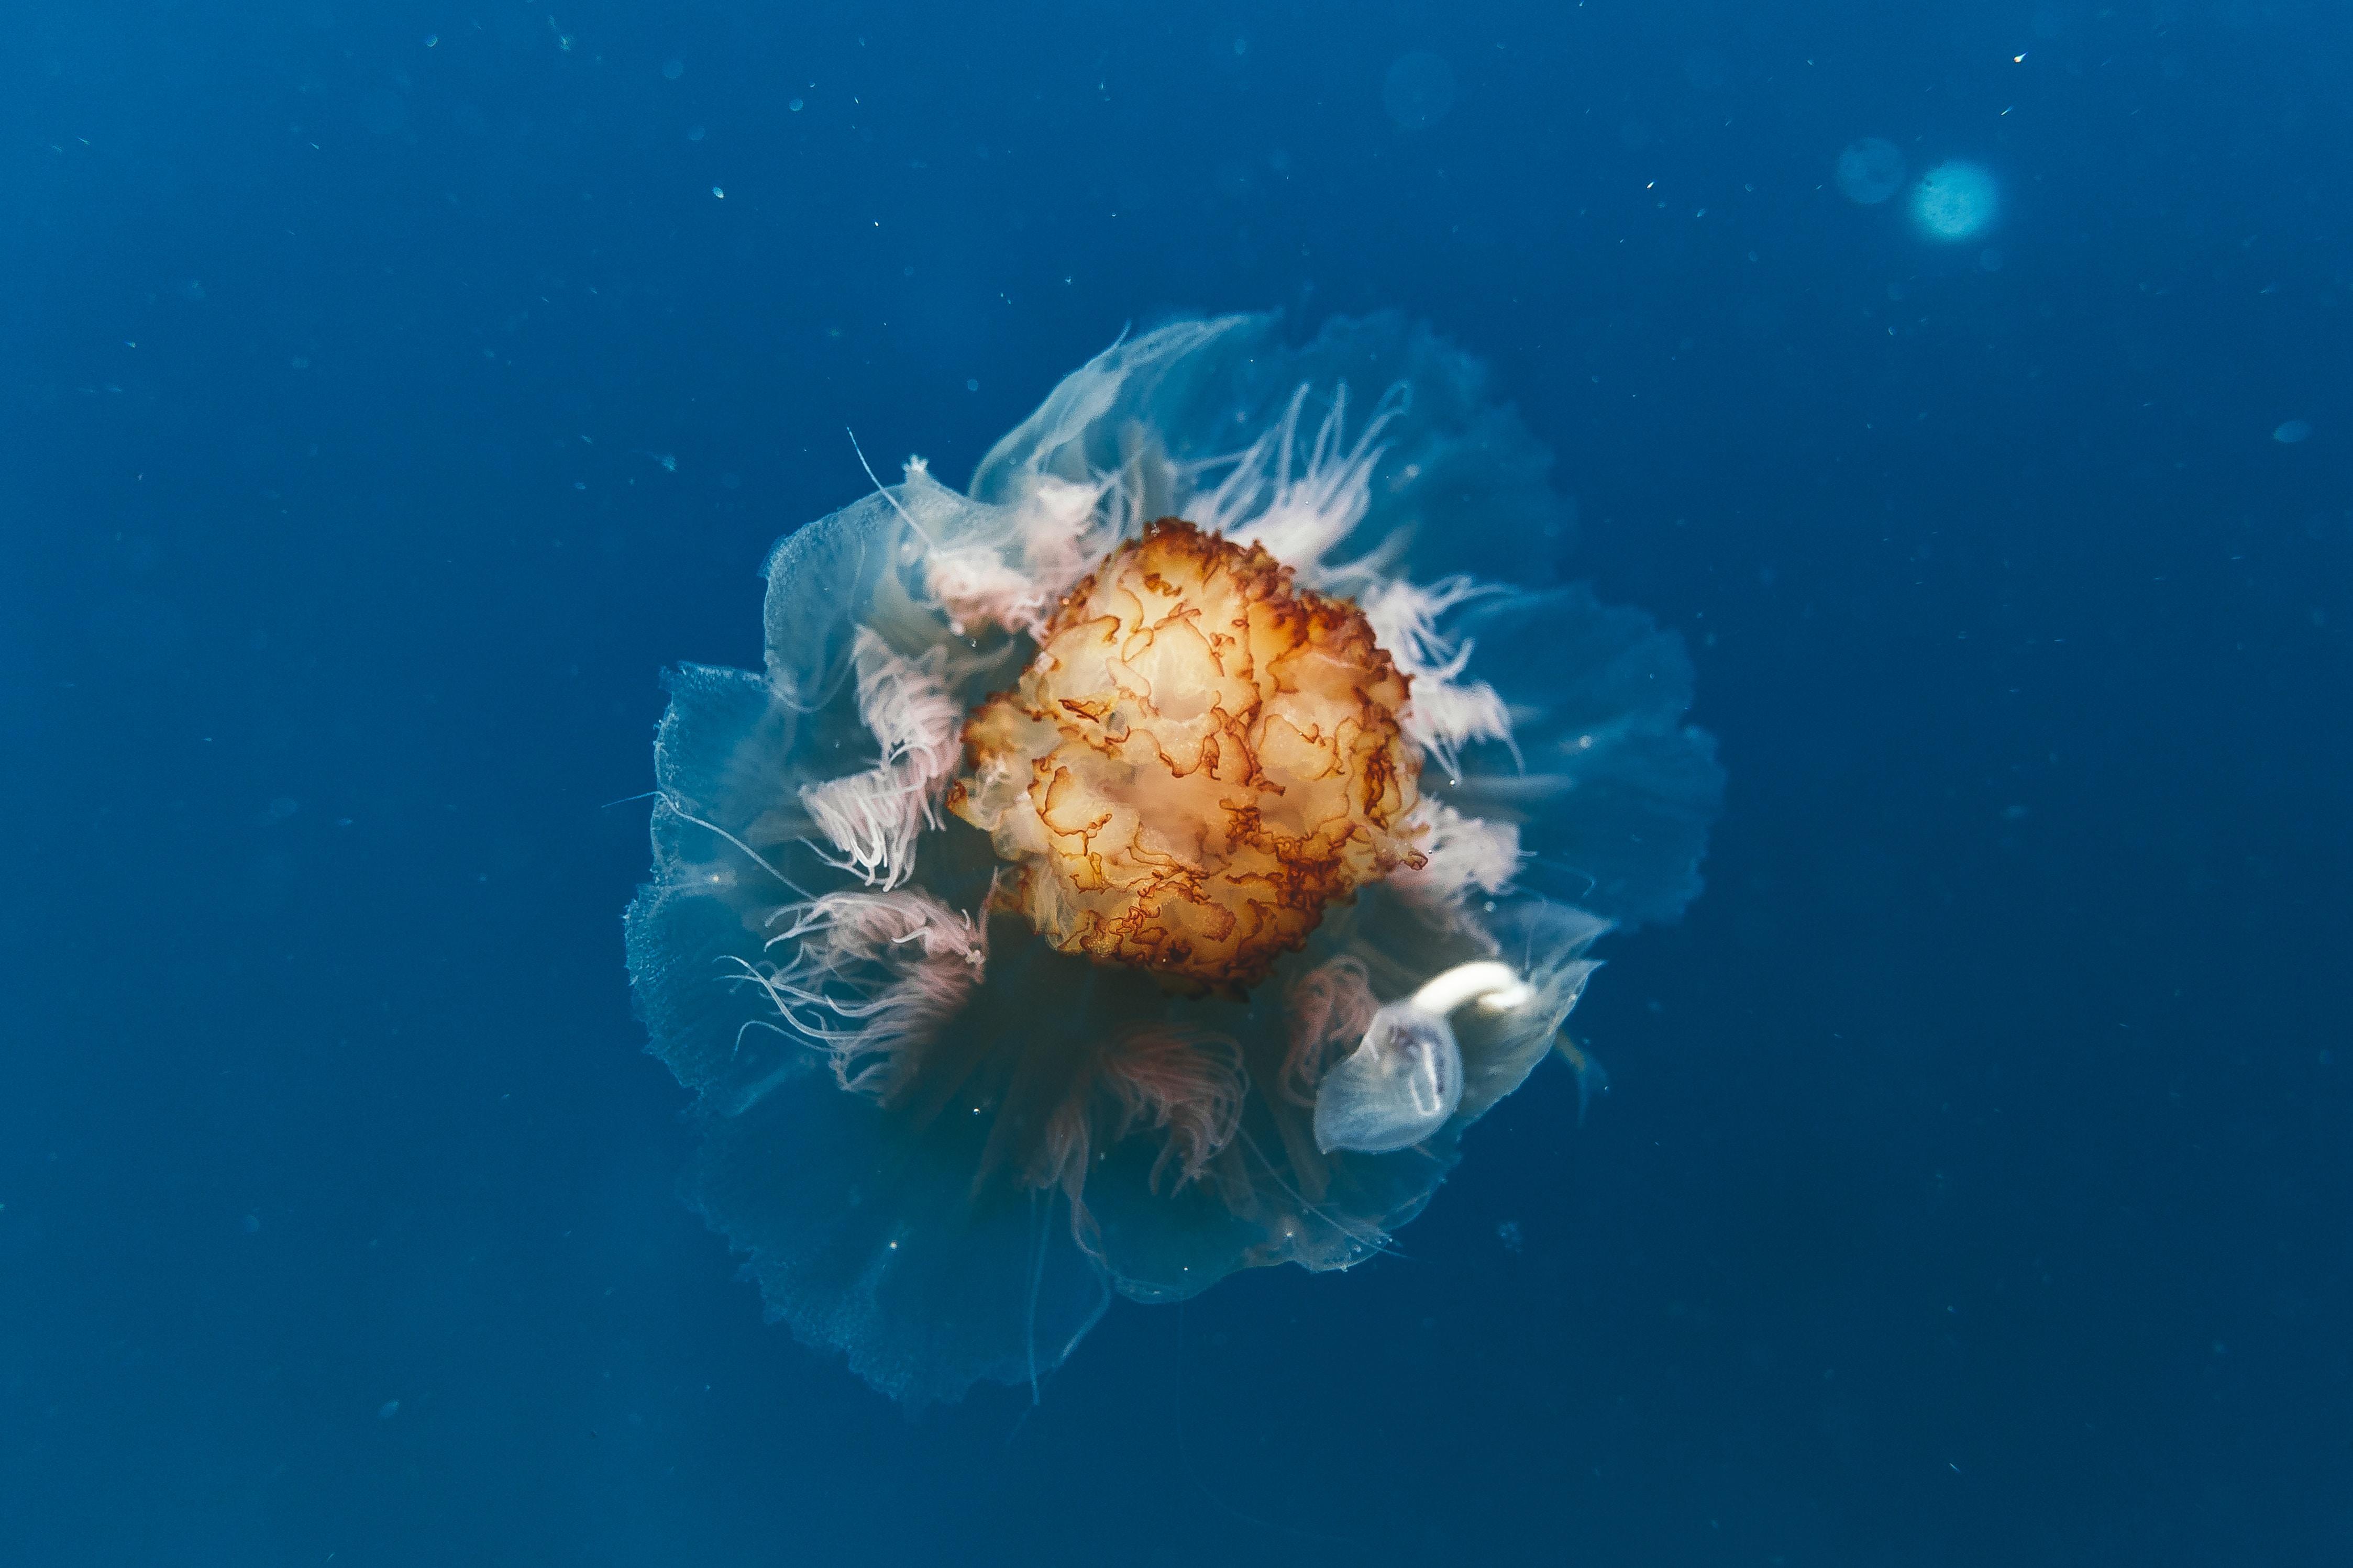 photo of brown sea creature